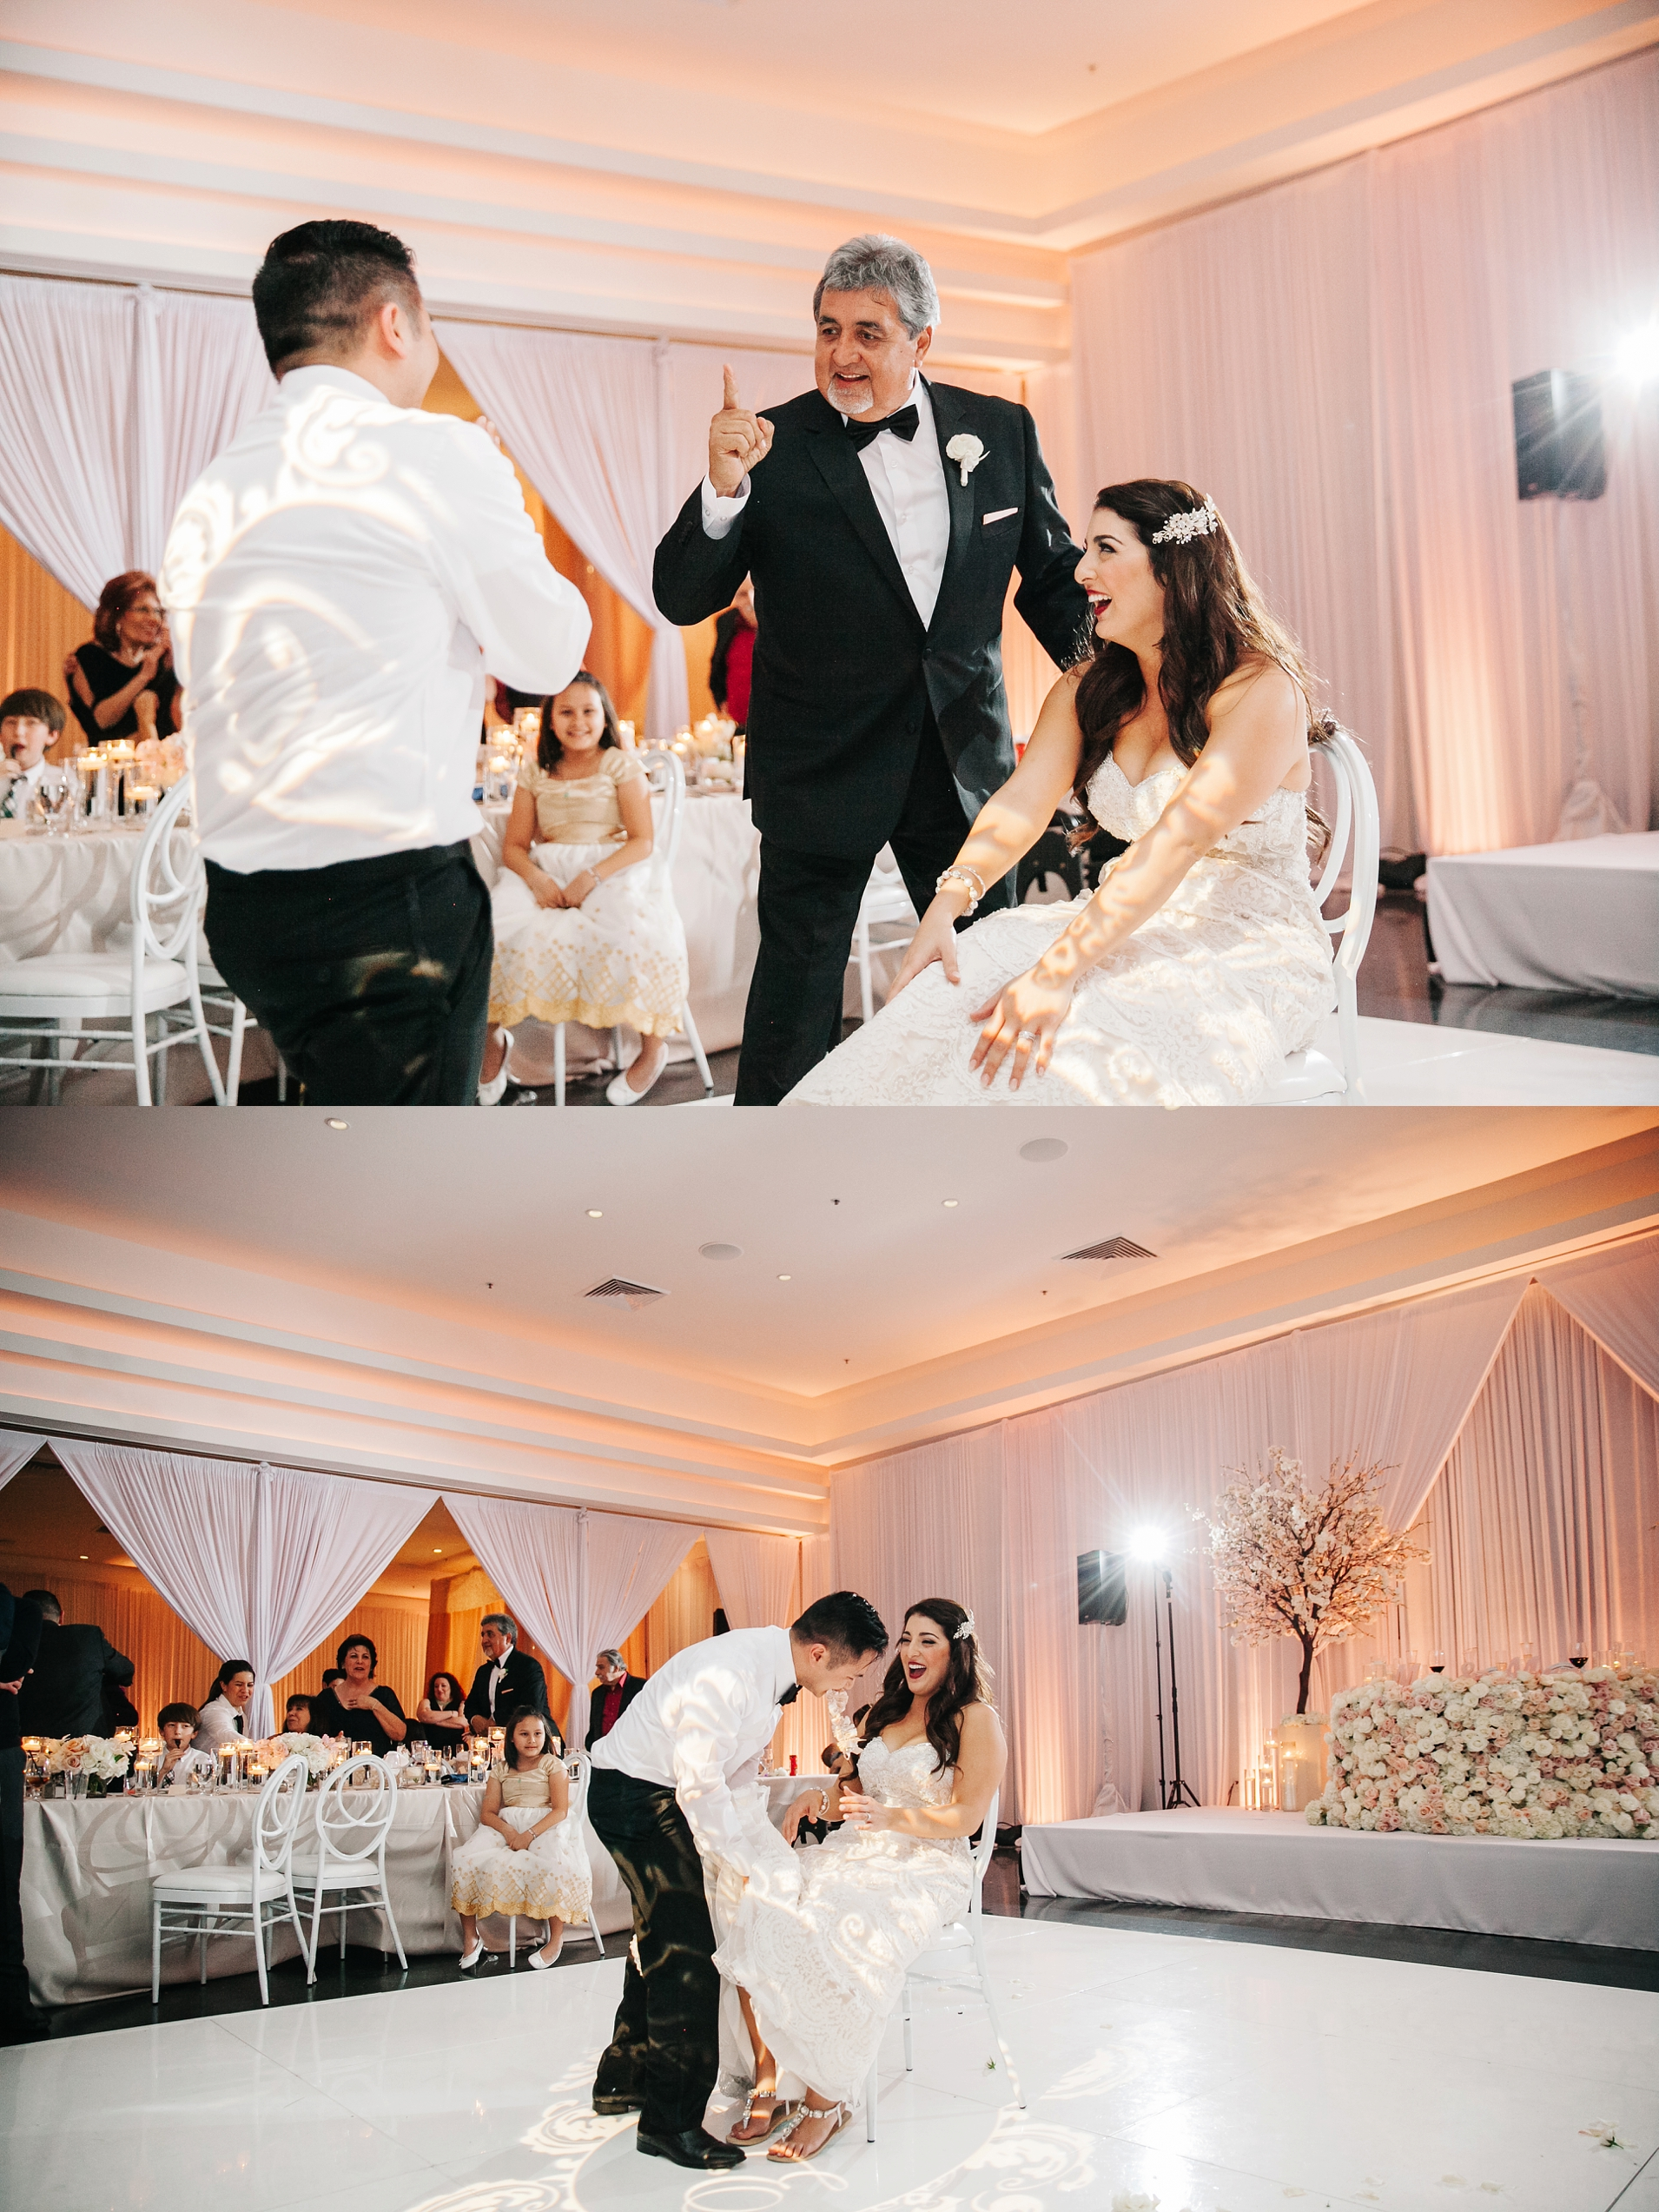 Garter Toss-Wedding Reception by Brittney Hannon Photography at Venue by Three Petals Wedding in Huntington Beach, CA